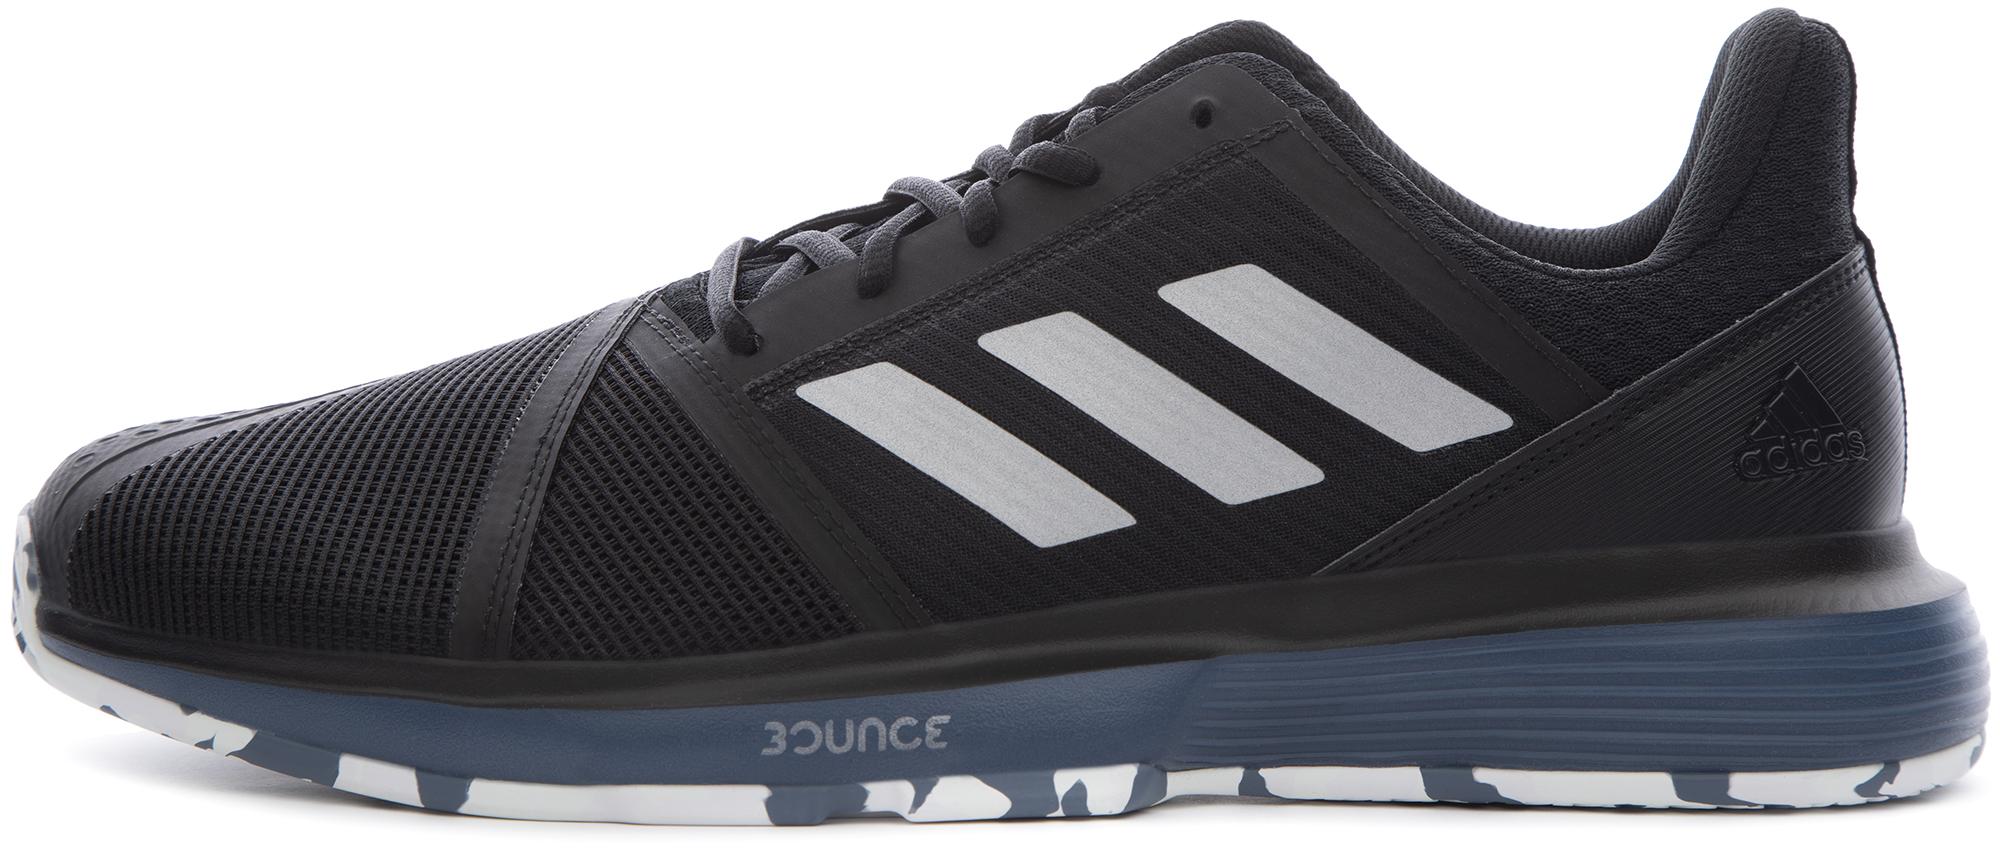 Adidas Кроссовки мужские Adidas Courtjam Bounce, размер 43 adidas кроссовки мужские adidas bounce размер 40 5